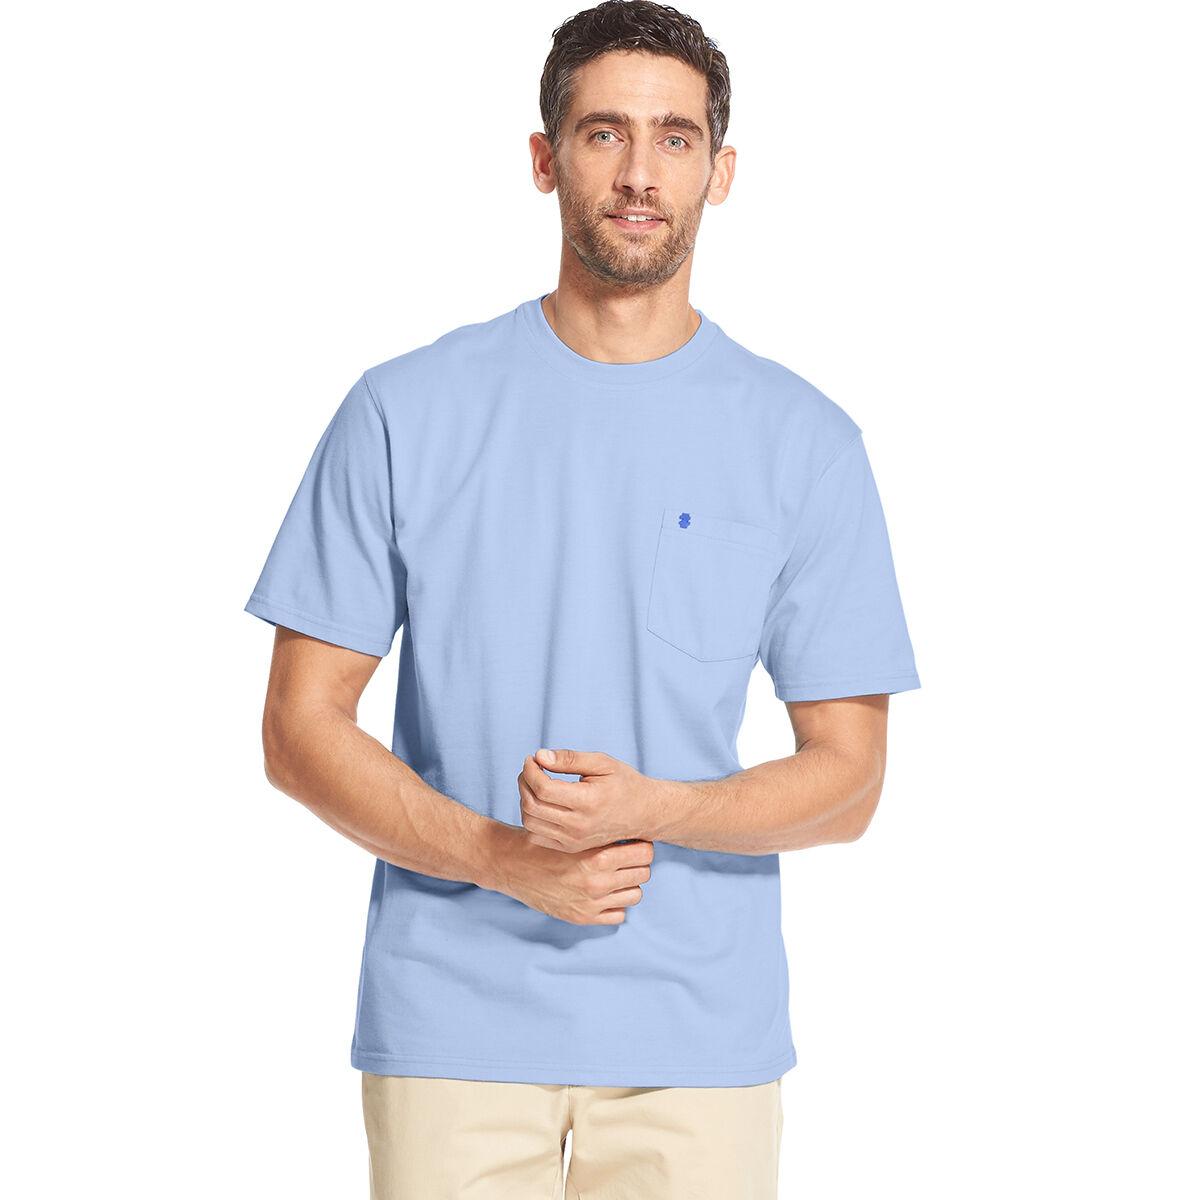 Izod Men's Saltwater Short-Sleeve Pocket Tee - Blue, XL